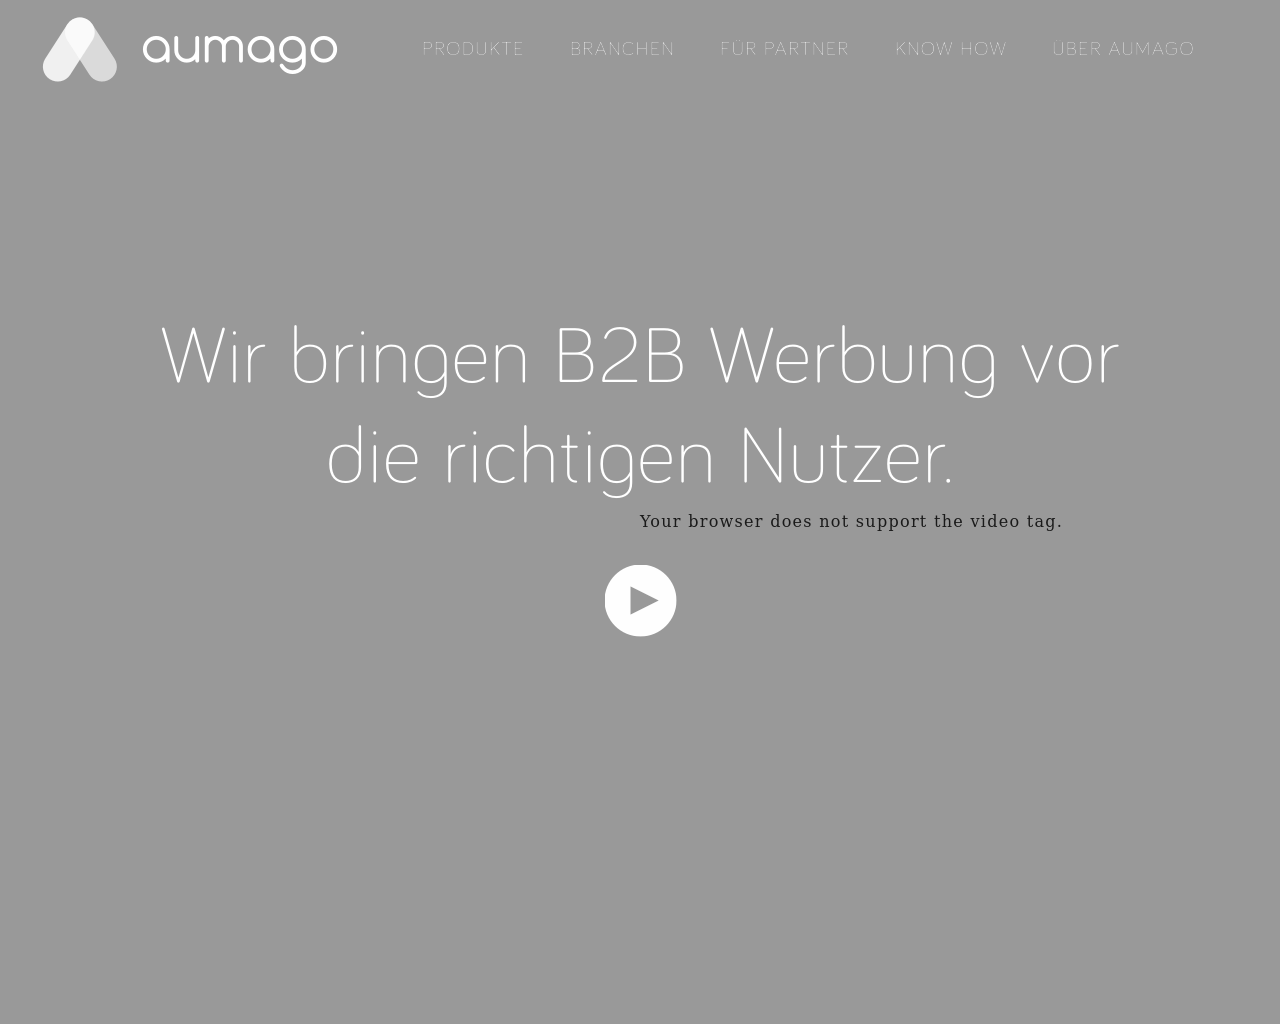 Aumago-GmbH-Advertising-Reviews-Pricing